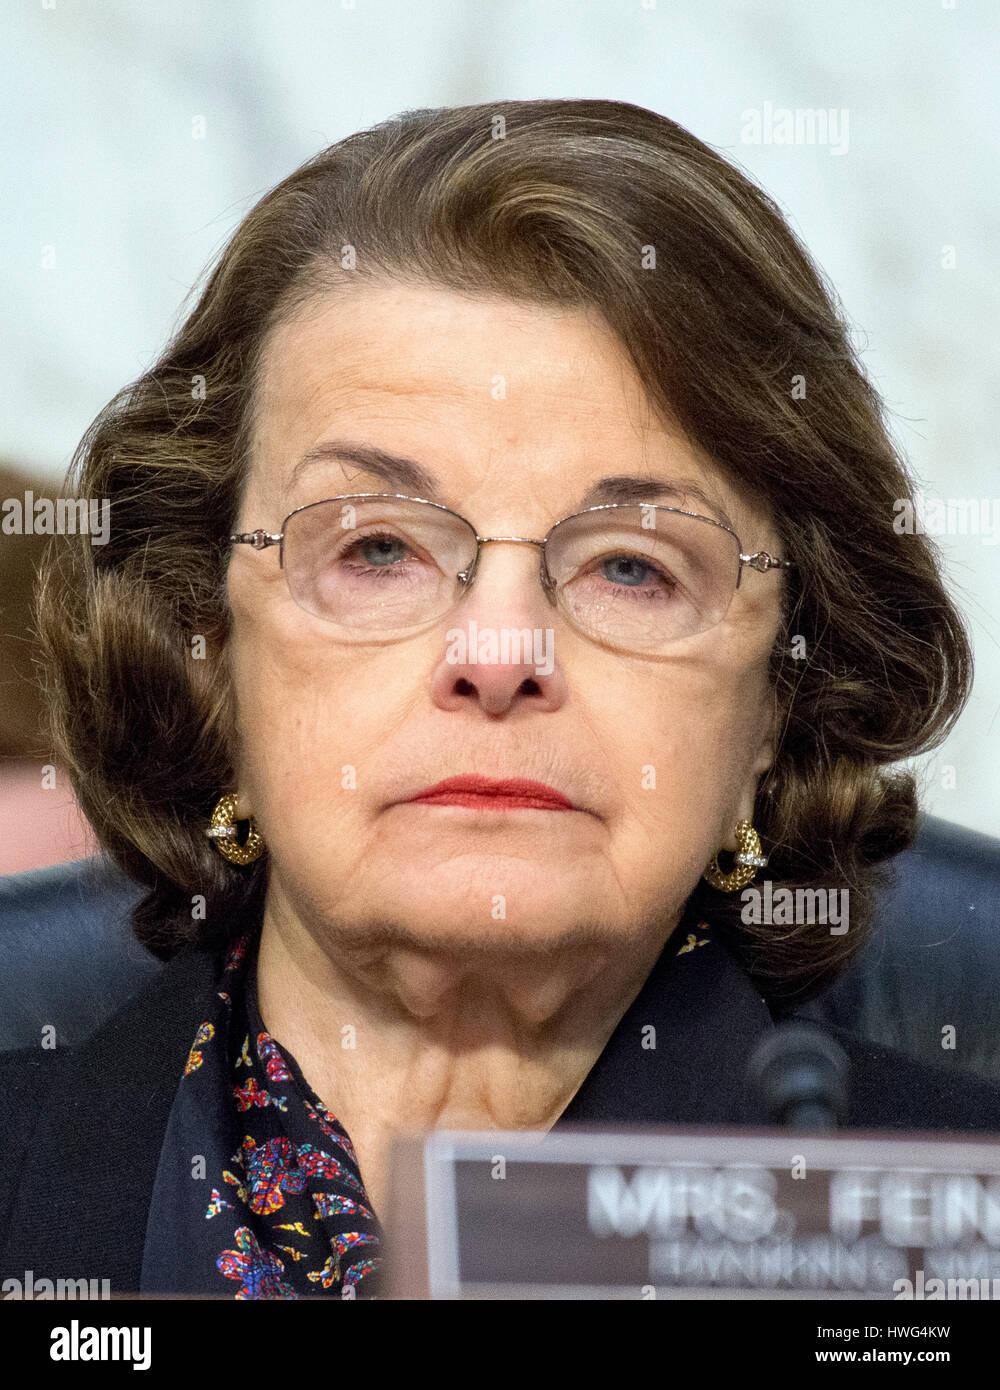 United States Senator Dianne Feinstein (Democrat of California) listens as Judge Neil Gorsuch testifies before the - Stock Image